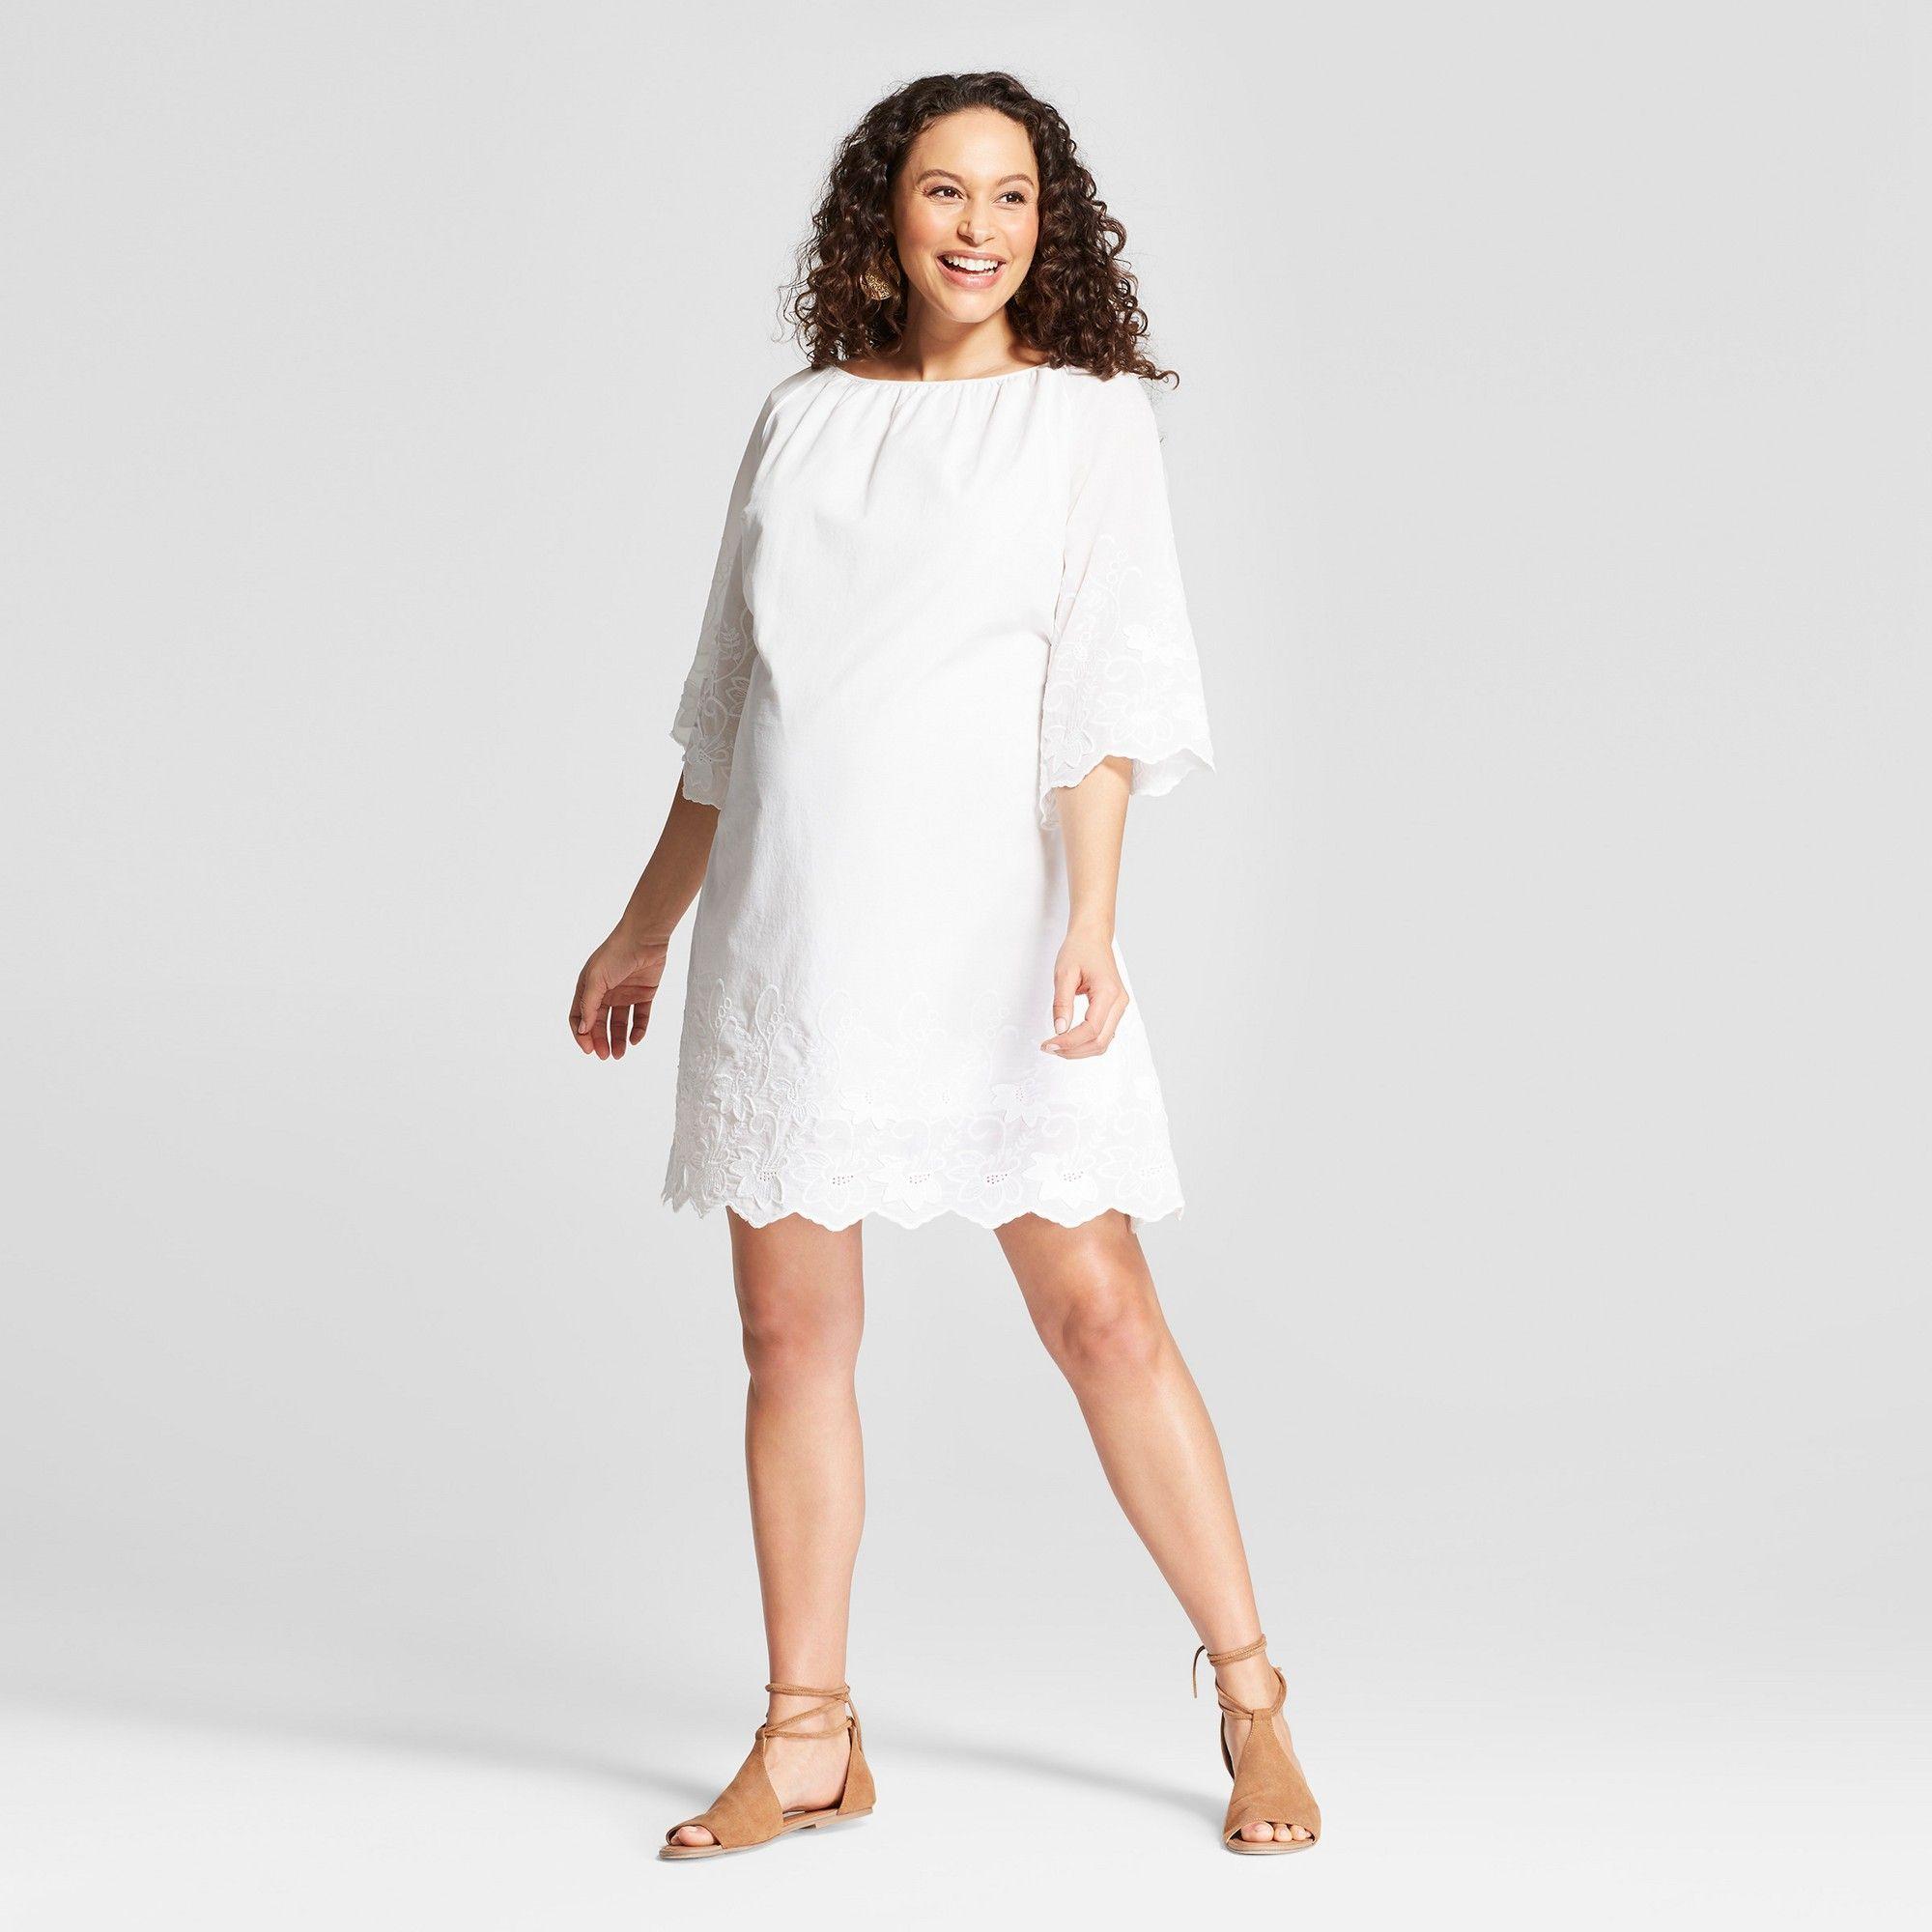 4741b282d7e Maternity Flutter Sleeve Swing Dress - Isabel Maternity by Ingrid   Isabel  Safari Rose S